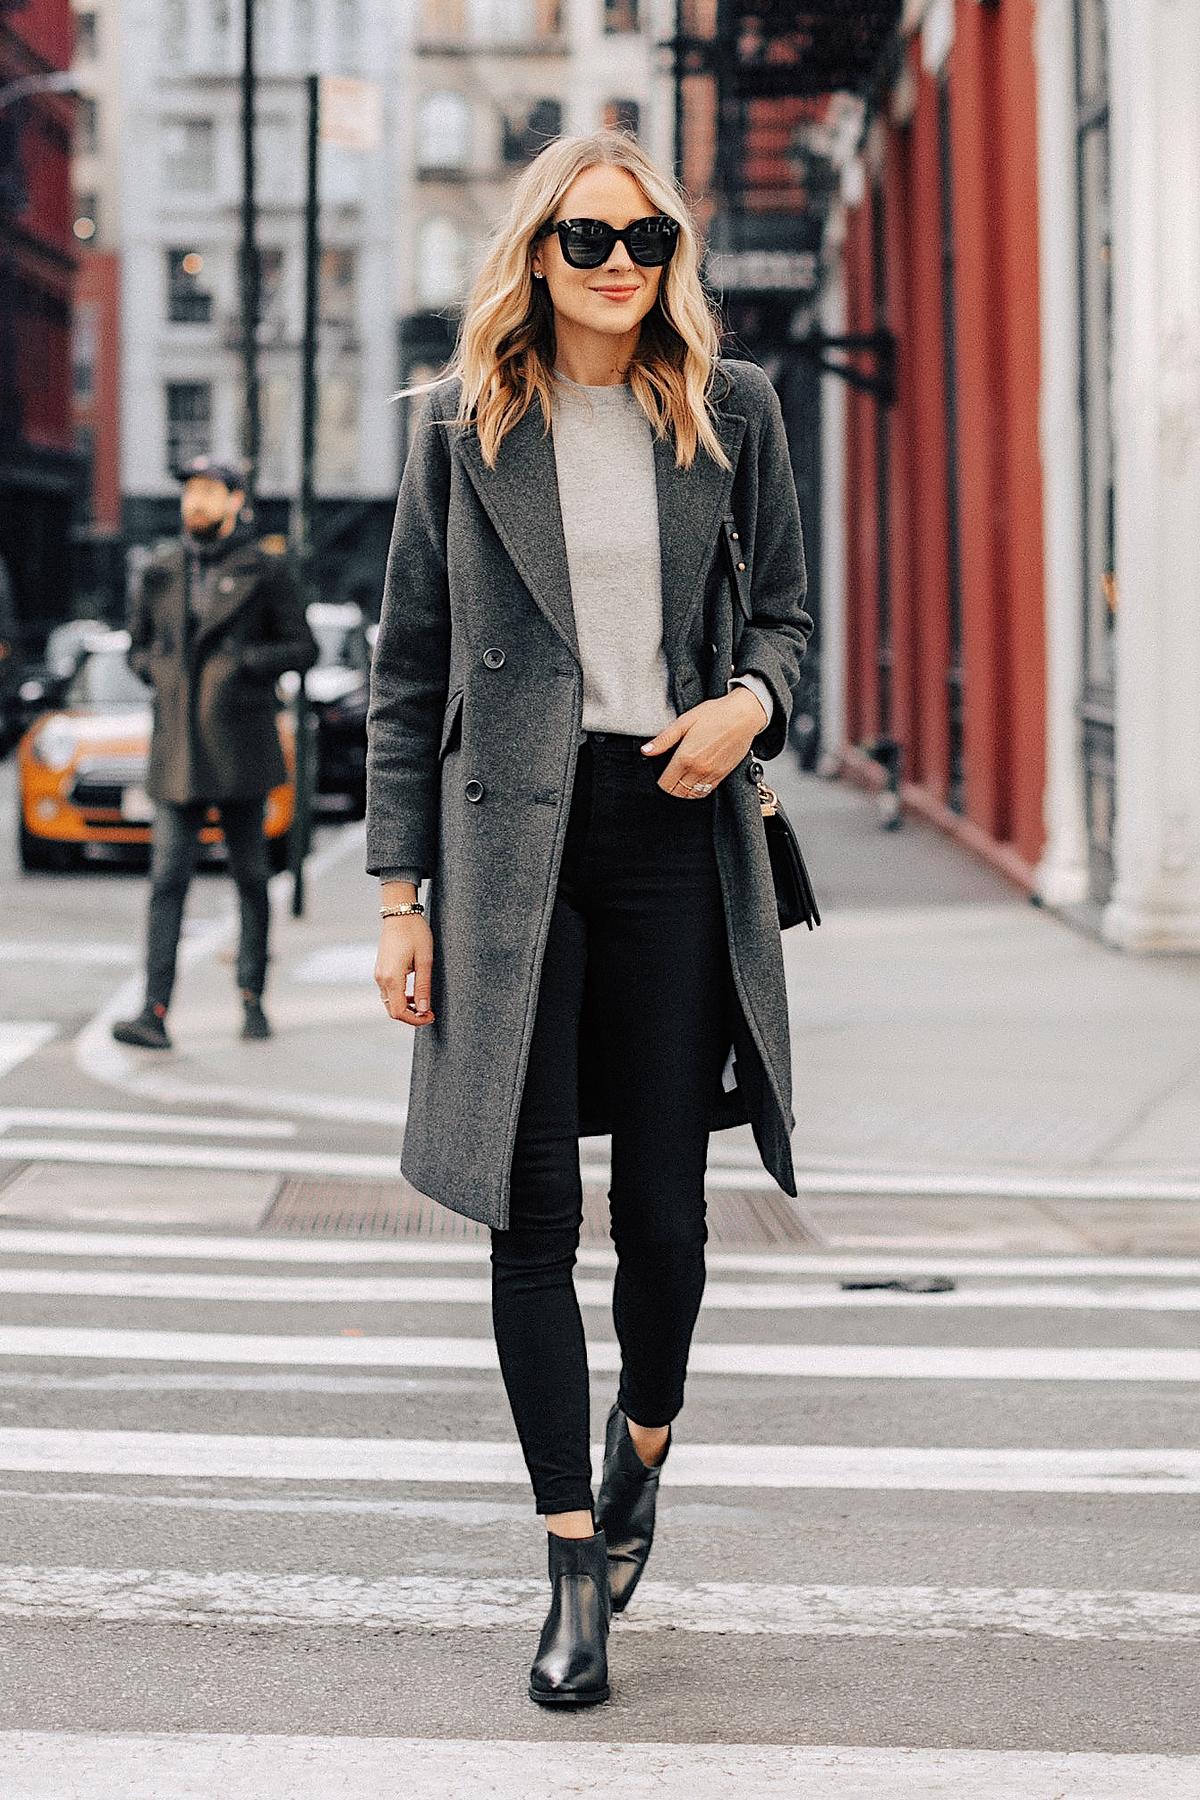 Fashion Jackson Wearing Grey Everlane Wool Overcoat Grey Sweater Black Skinny Jeans Black Booties